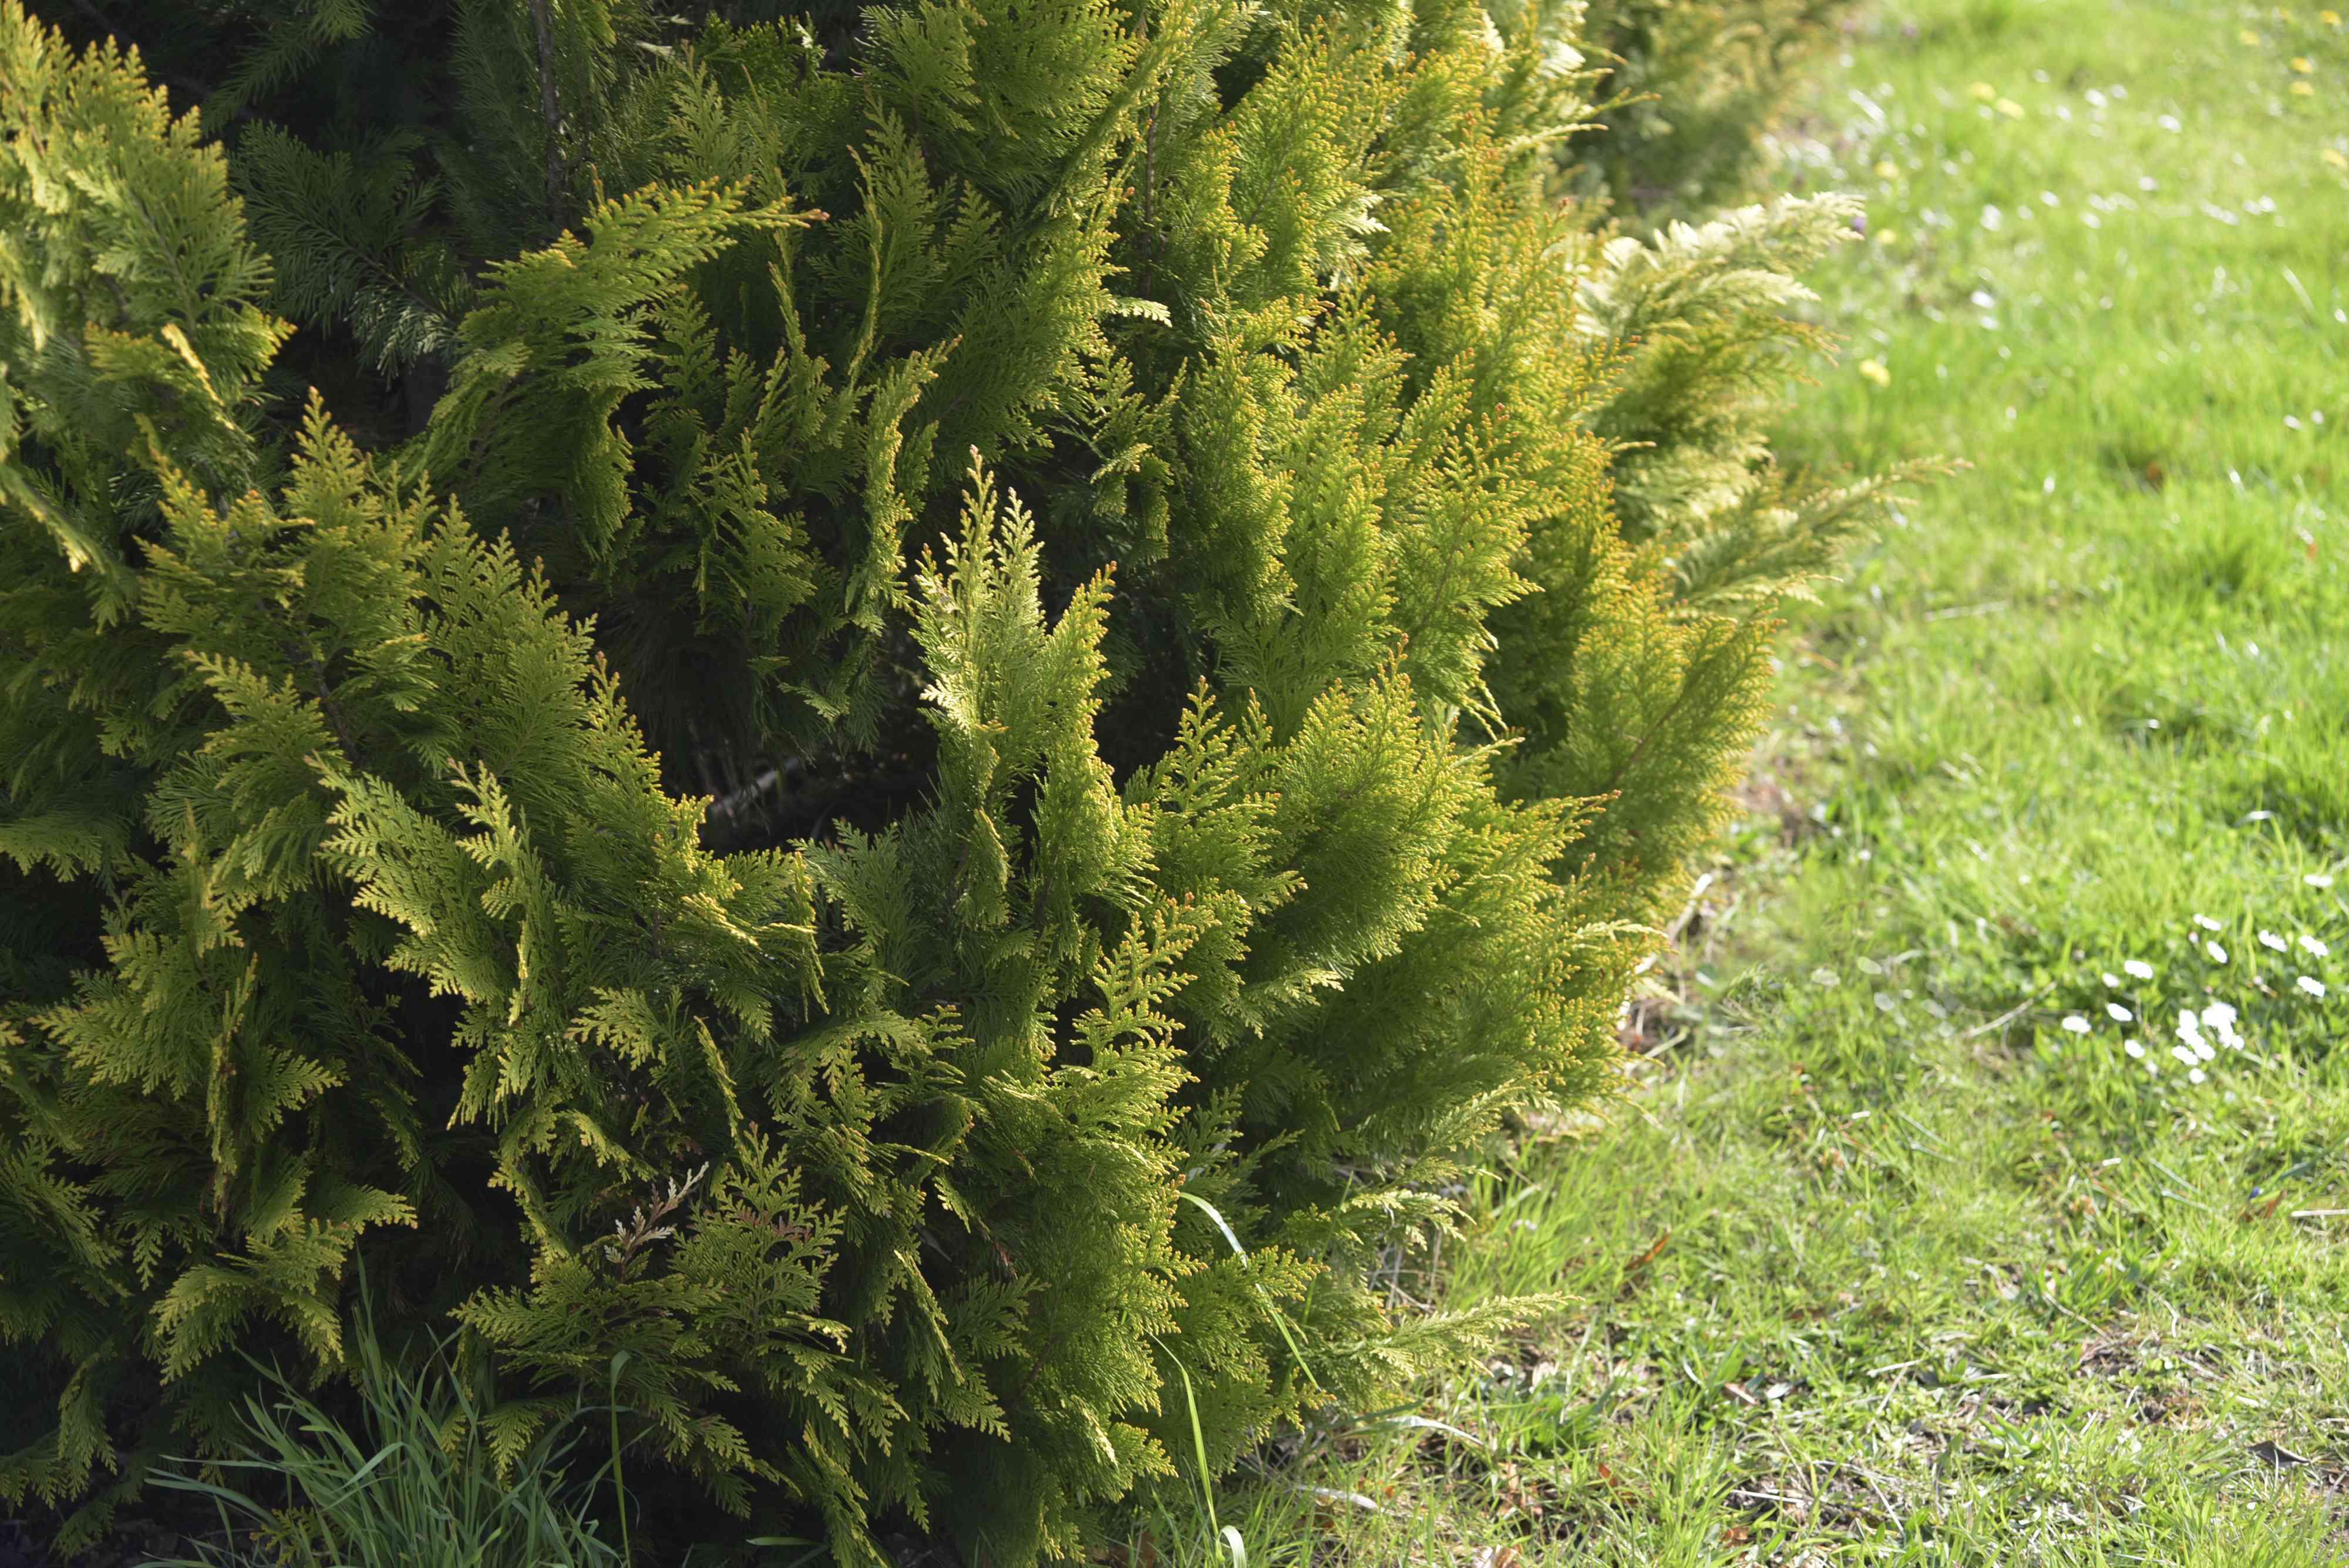 False cypress chamaecyparis lawsoniana tree with flat and feathery foliage on edge of grass lawn